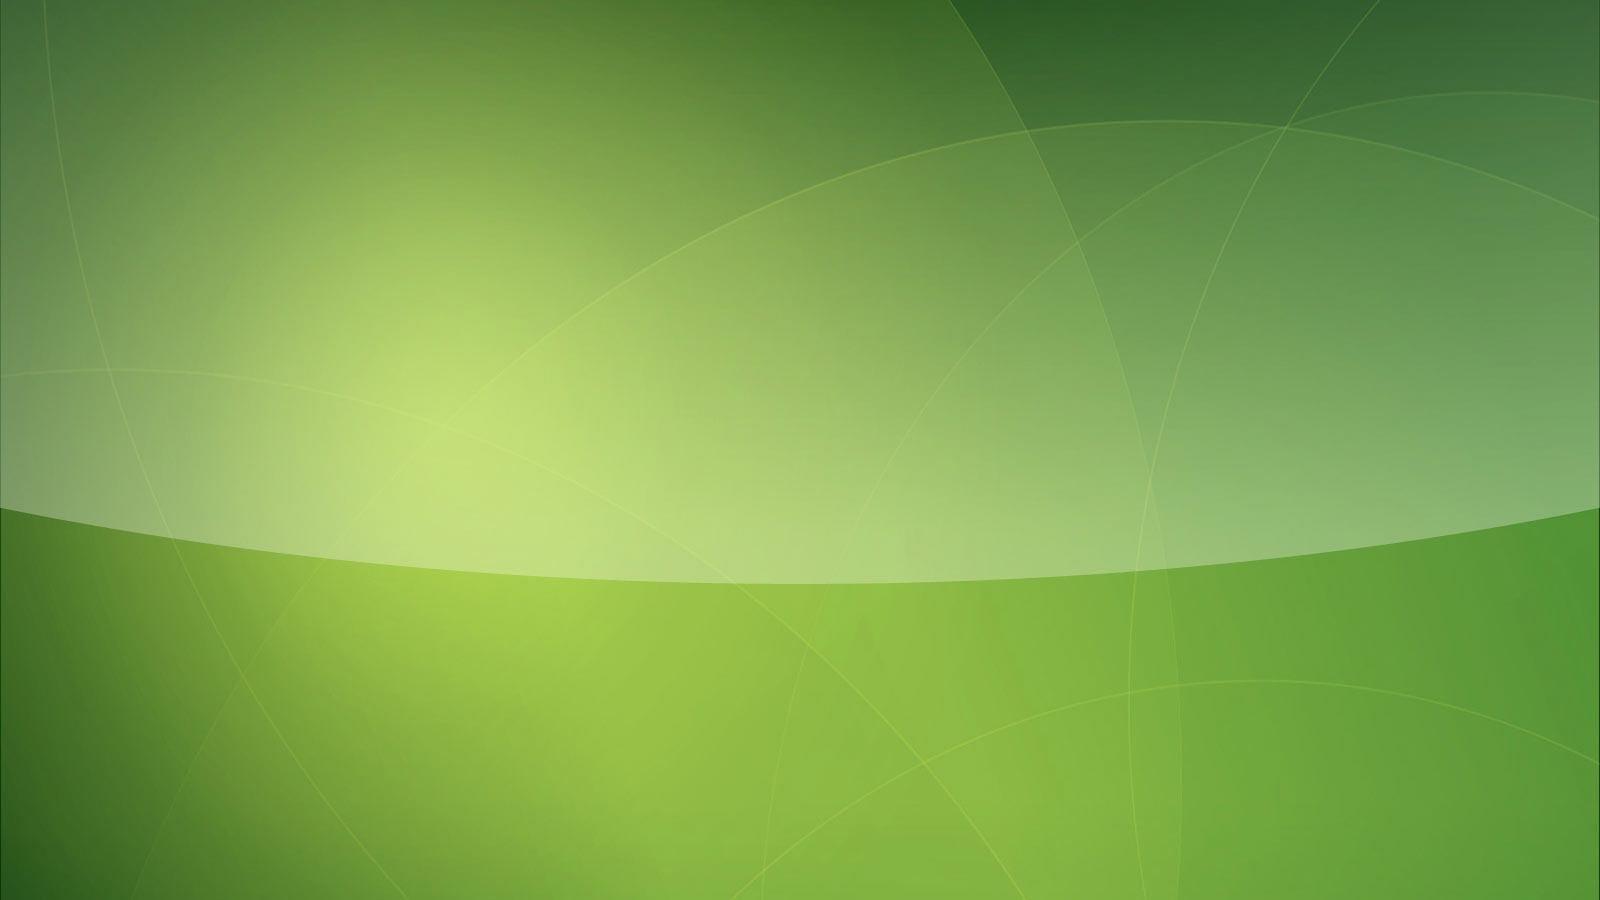 green dell desktop wallpapers 1600x900 - photo #1